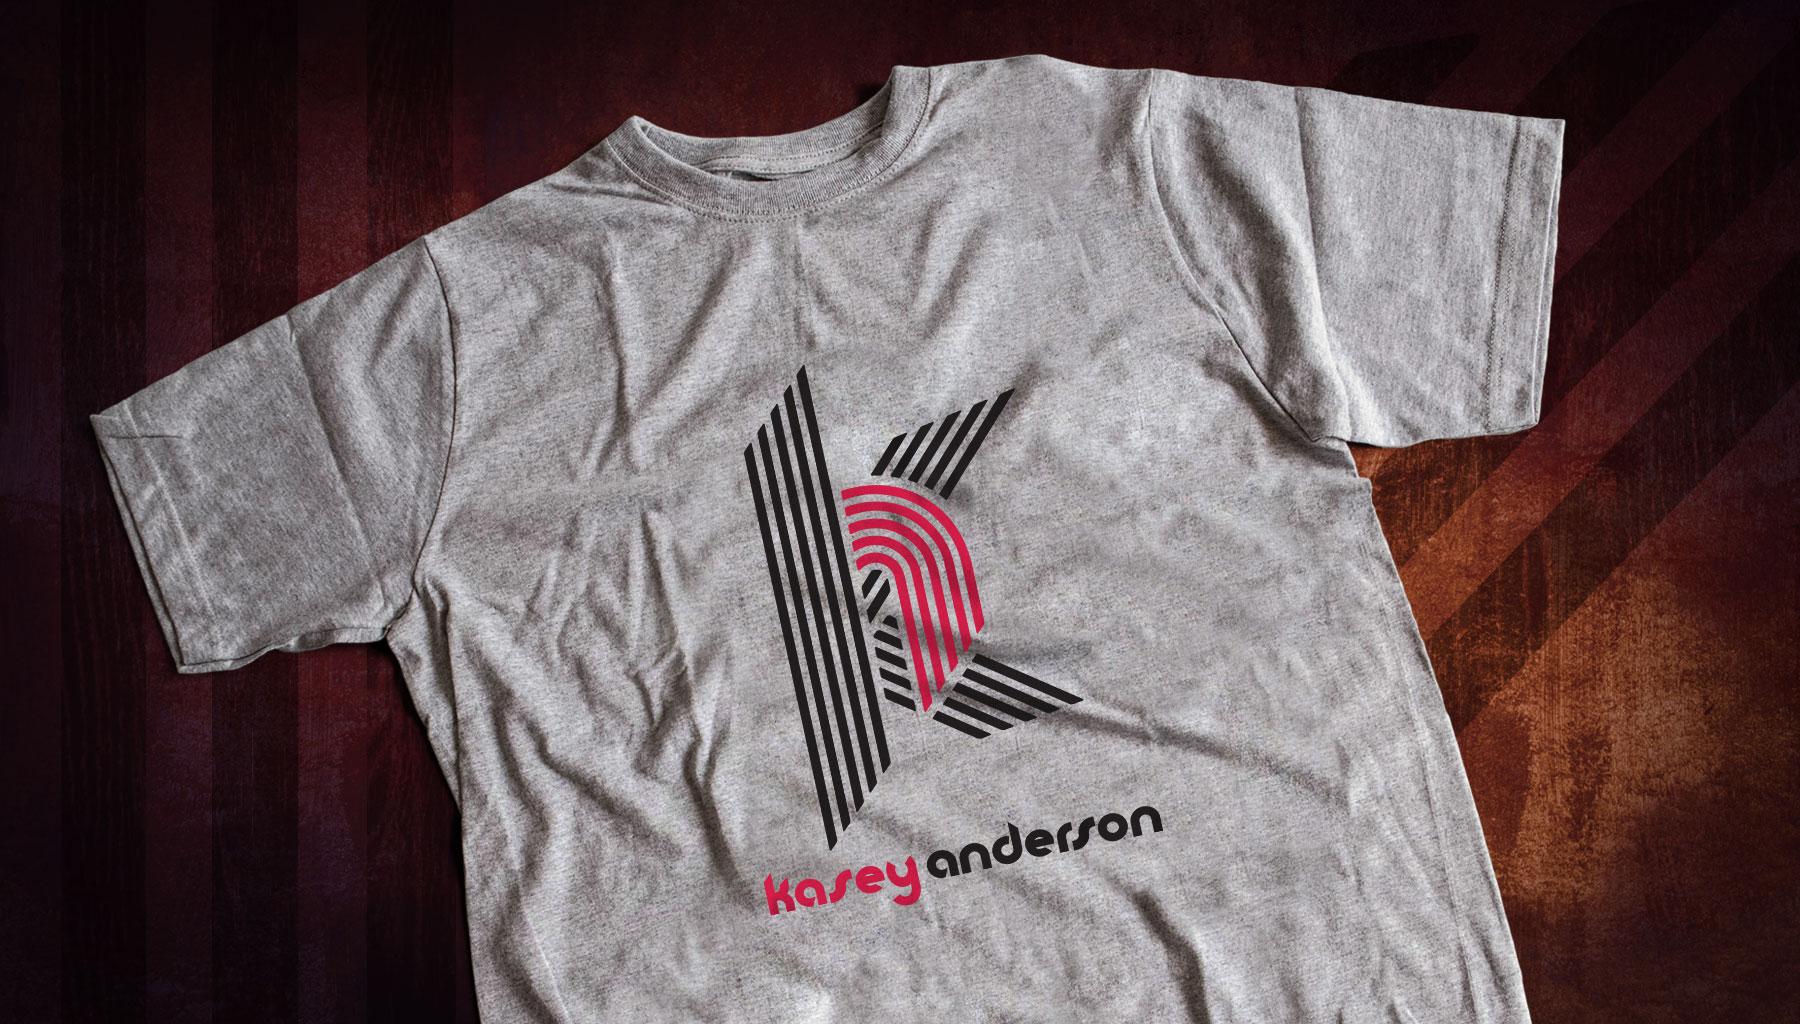 Kasey Anderson Trailblazers Shirt